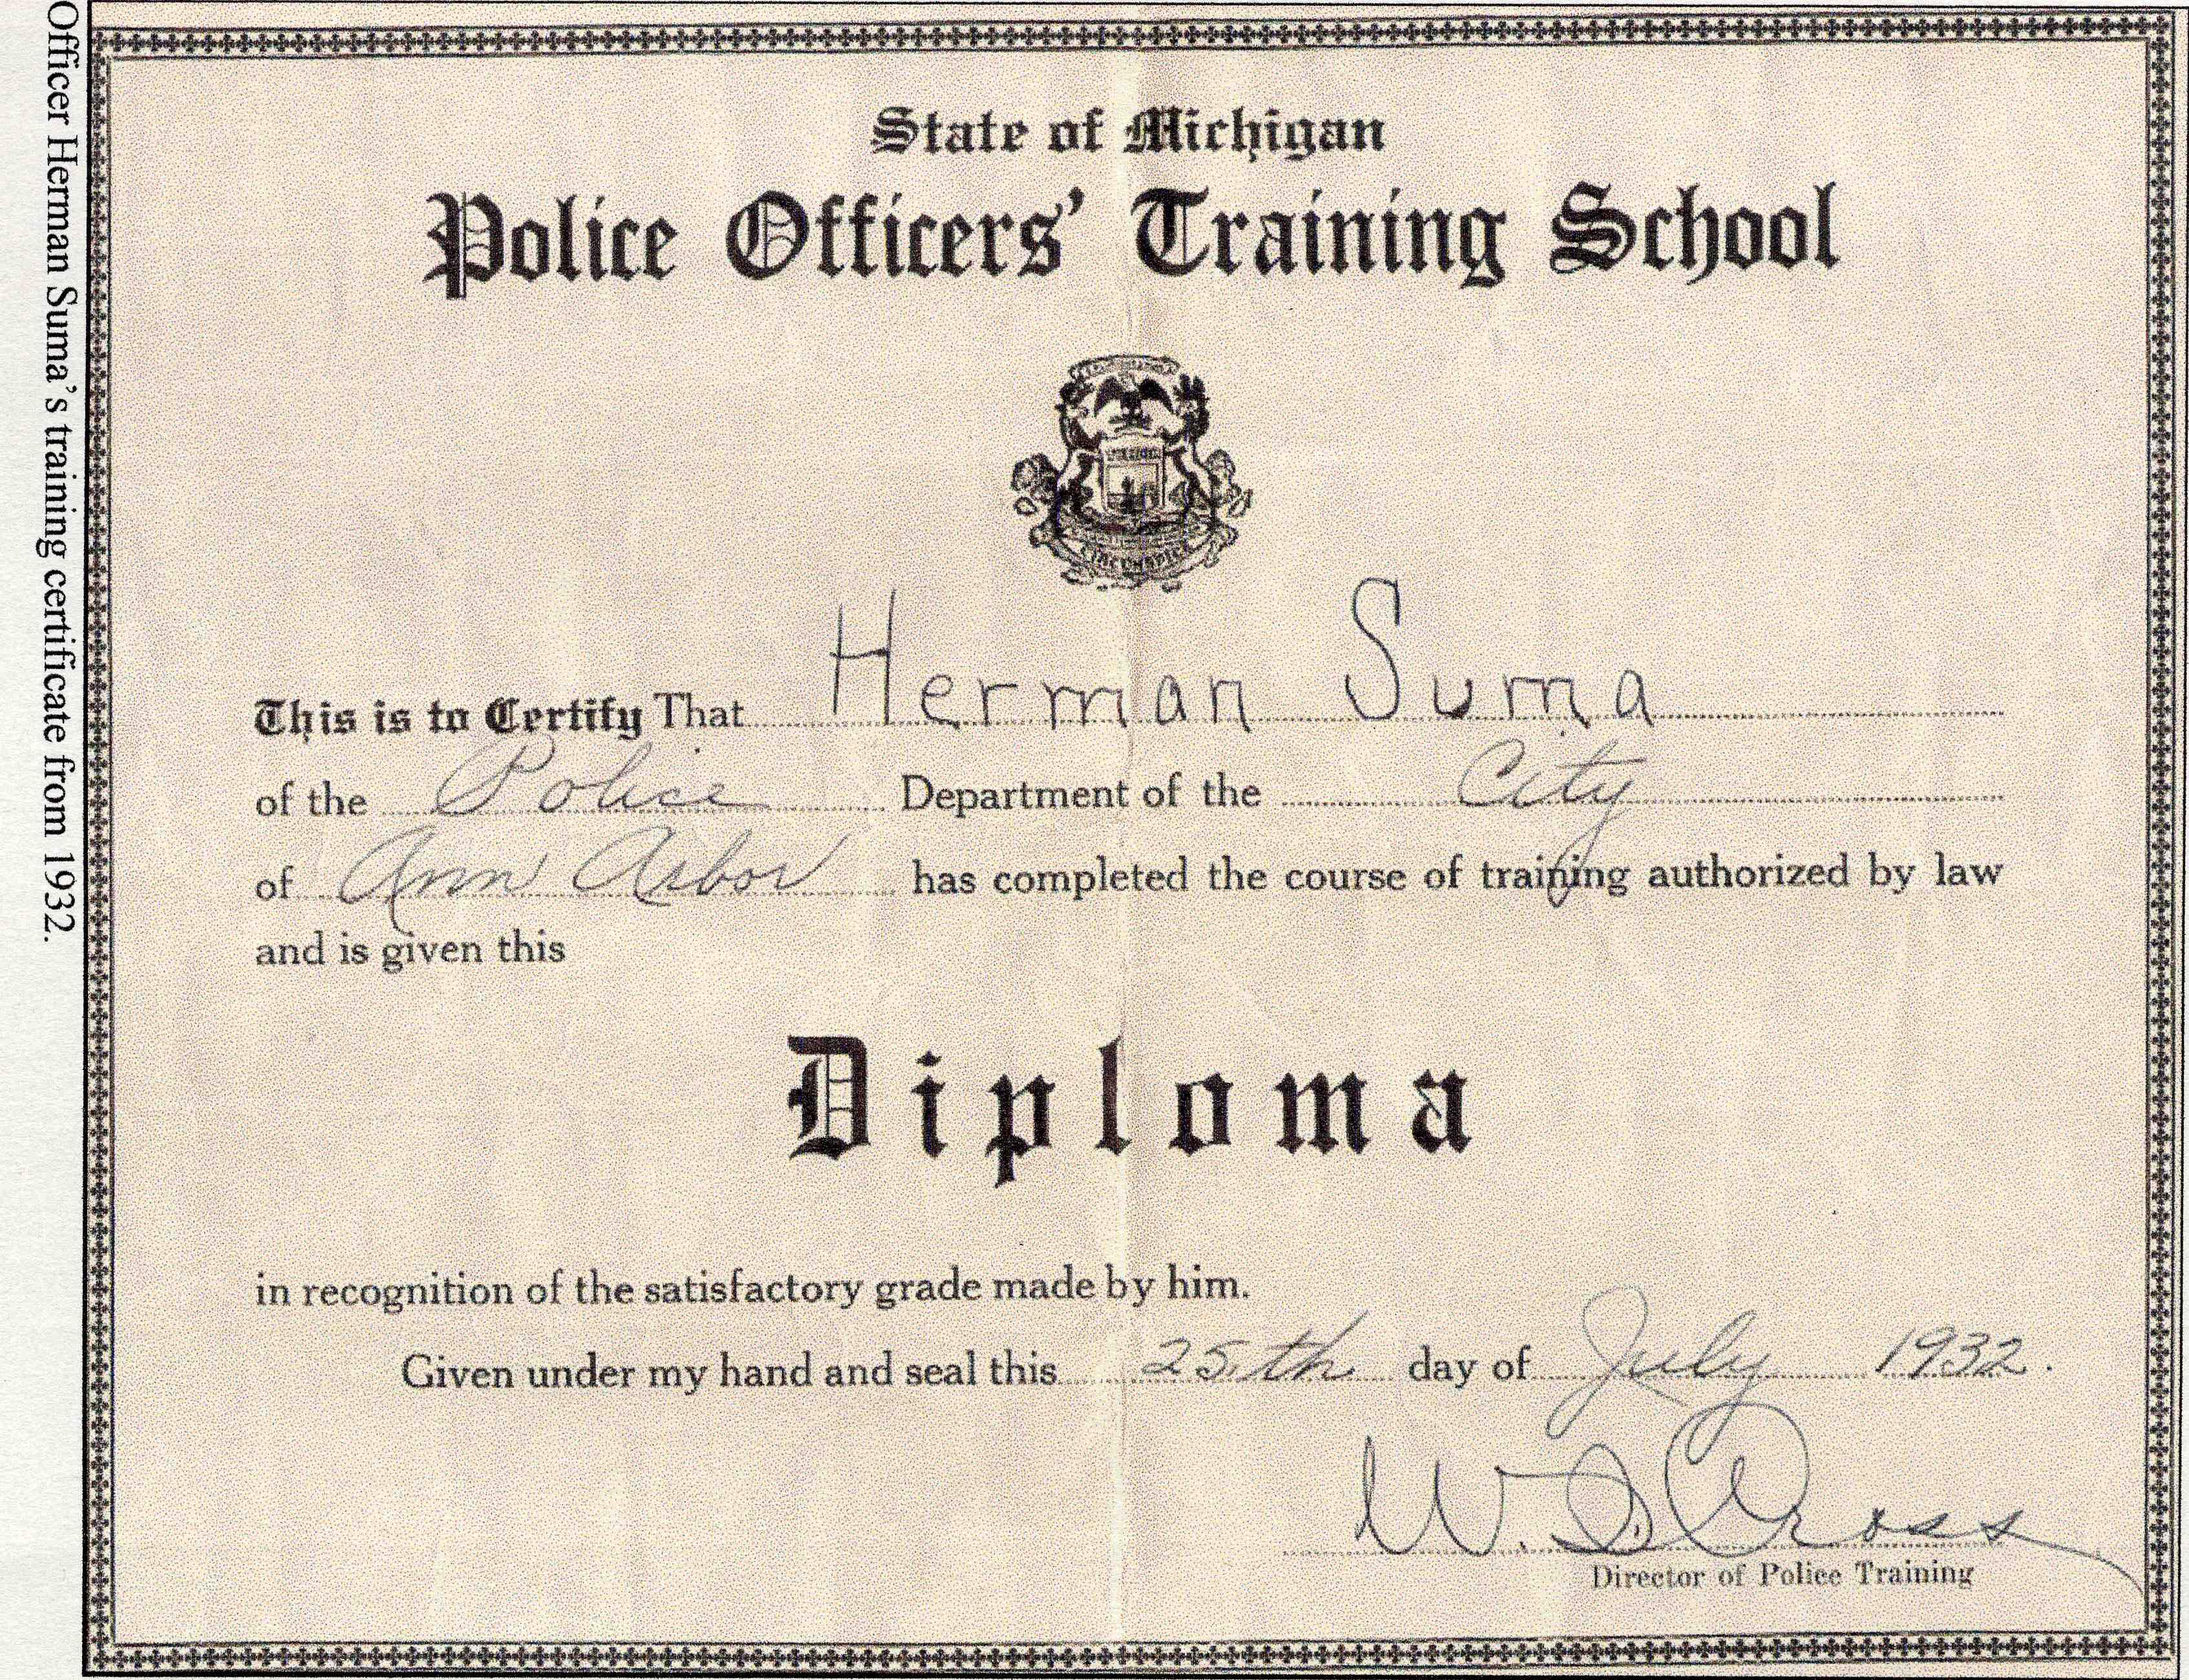 Ann arbor police department officer herman sumas training ann arbor police department officer herman sumas training certificate image xflitez Choice Image